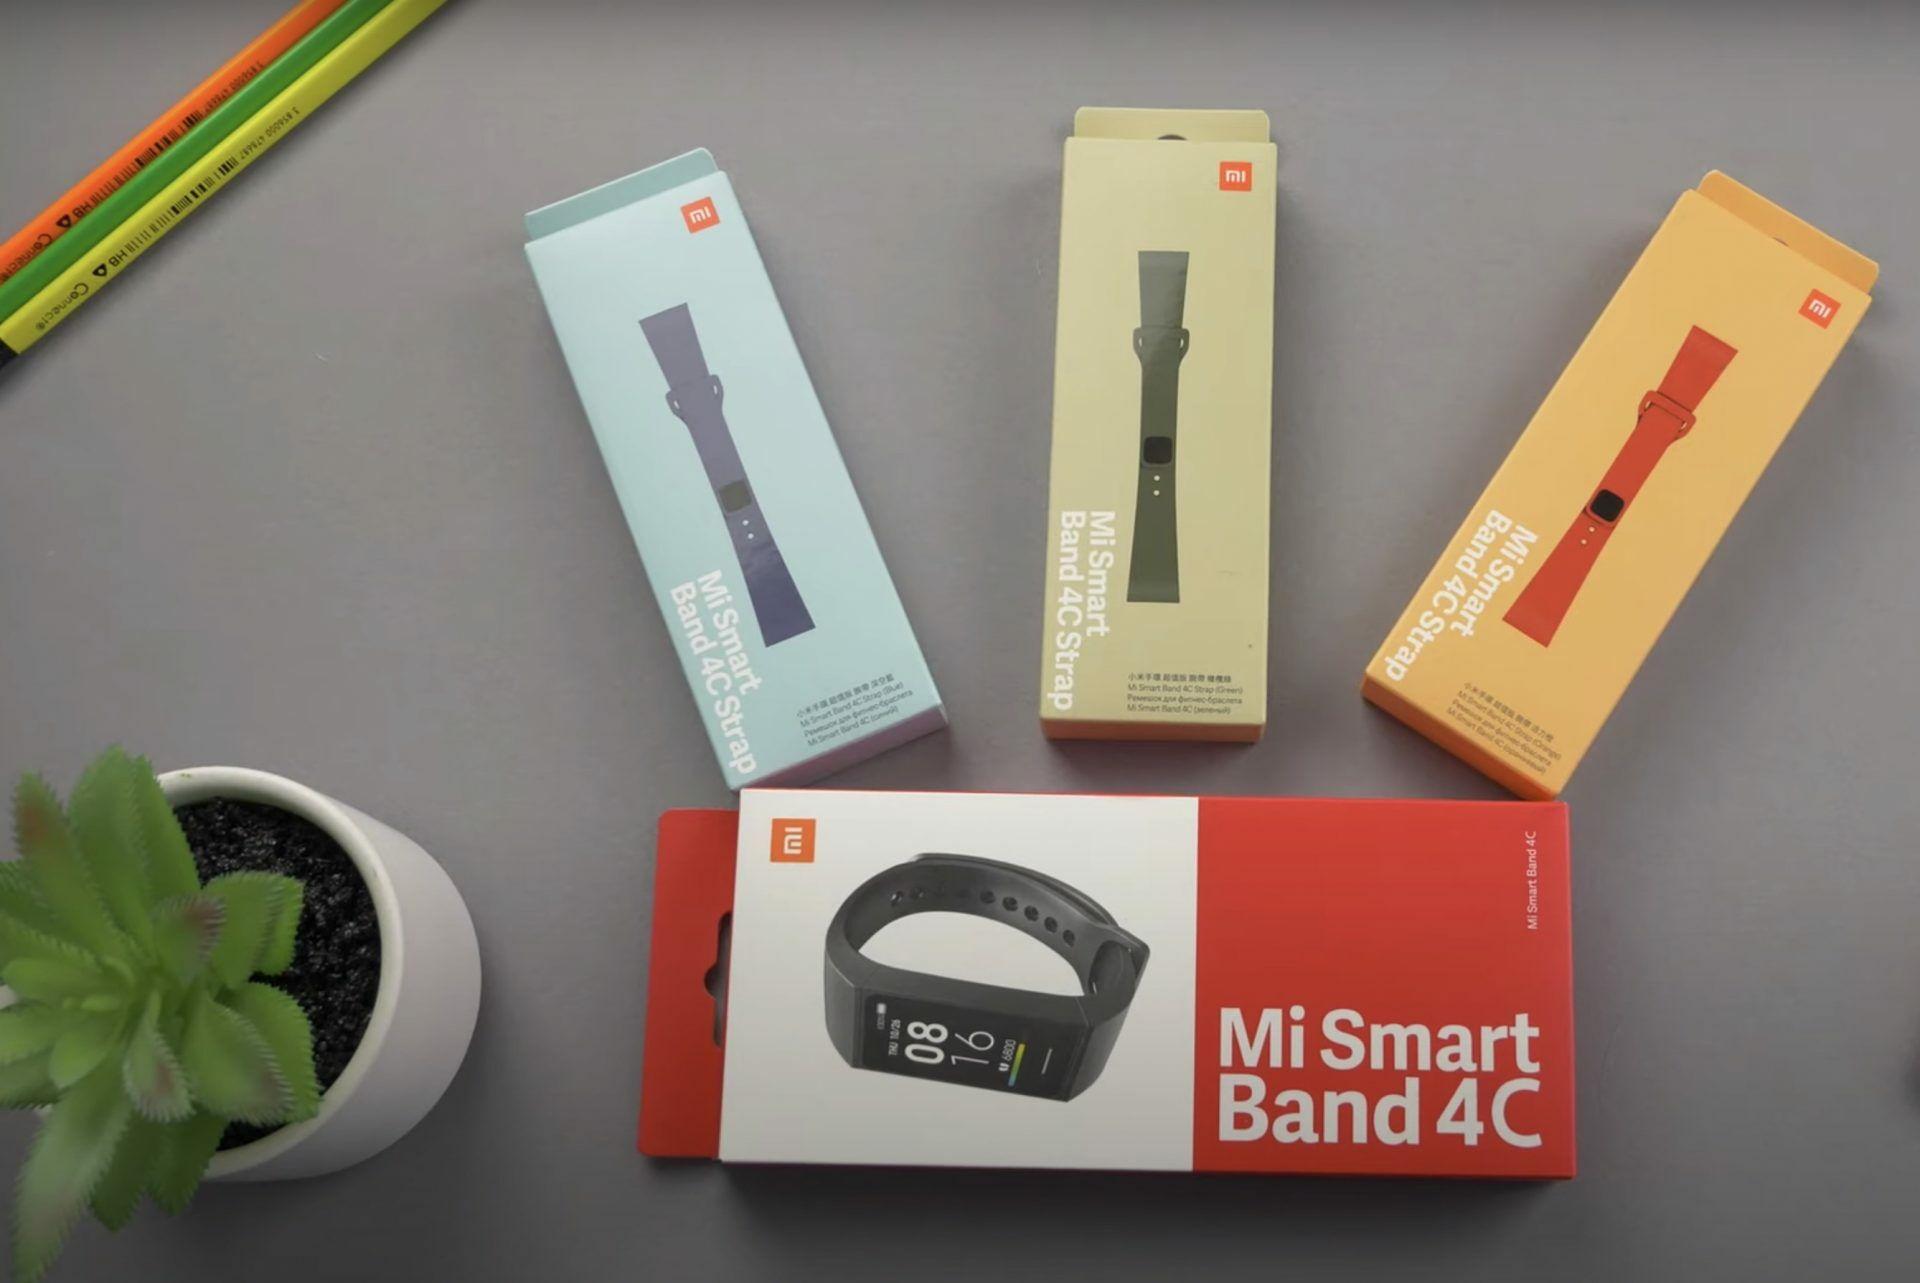 Xiaomi Mi Smart Band 4C bemutató